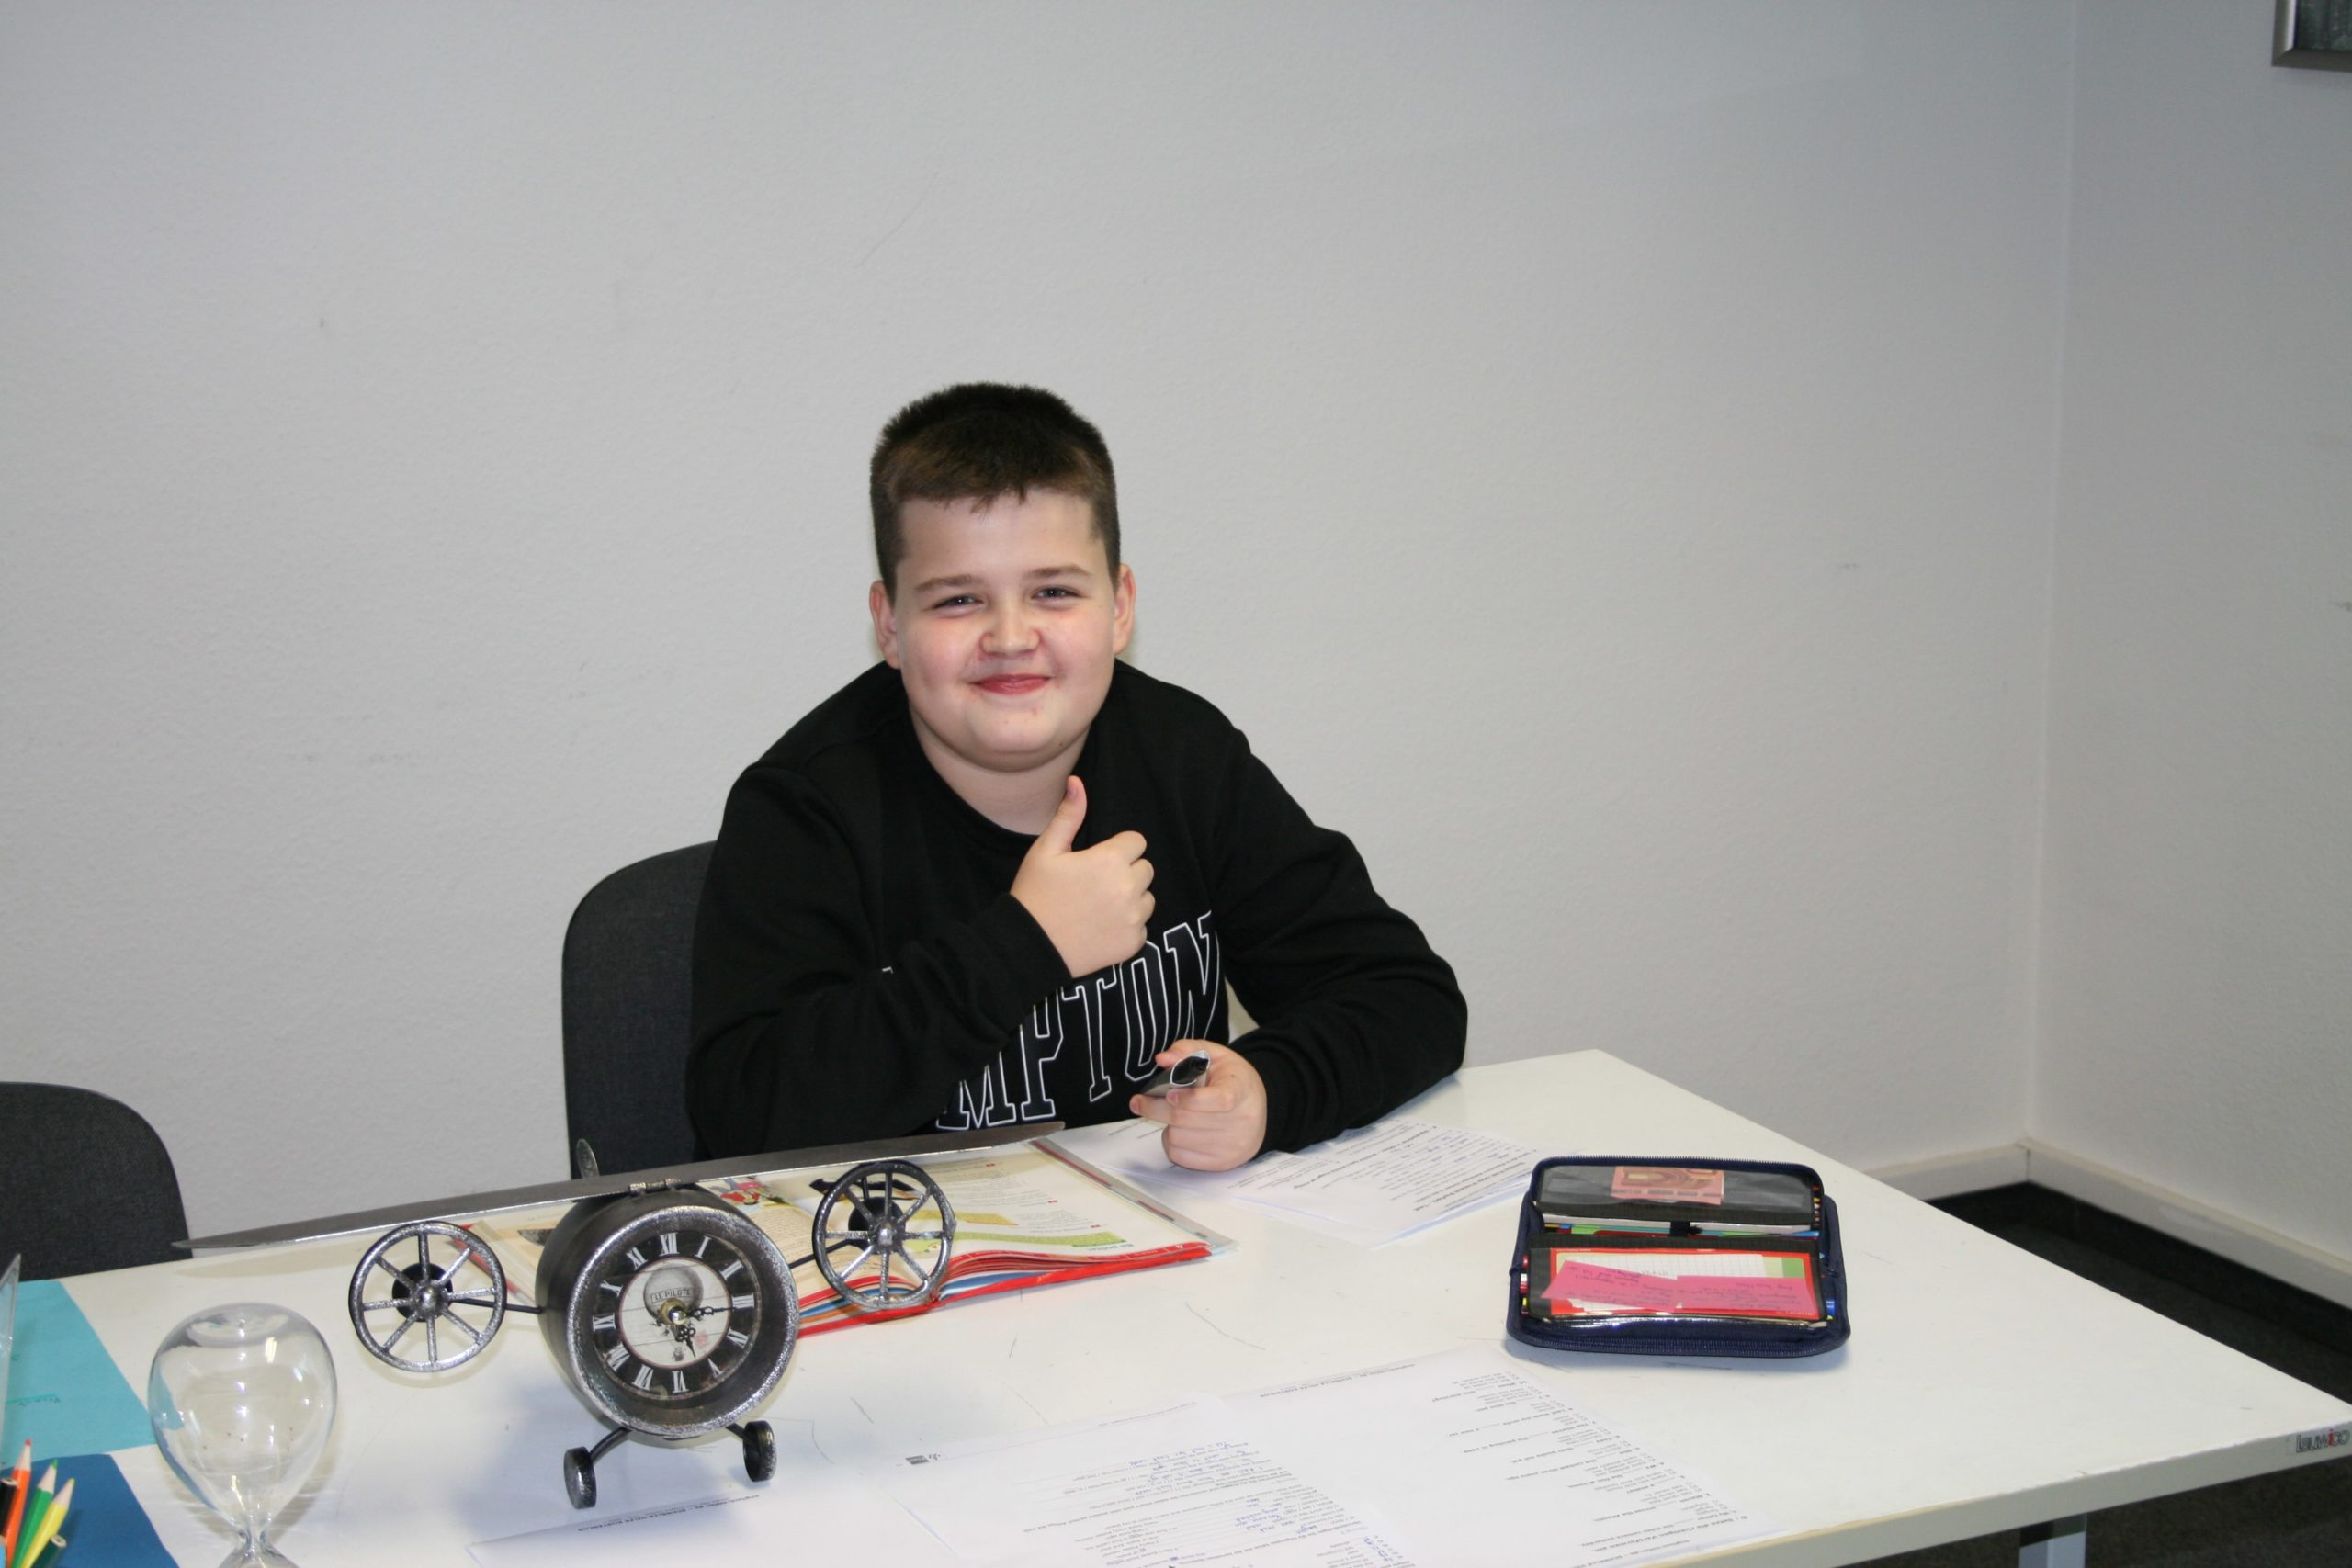 mechanik nachhilfe für Schüler fulda